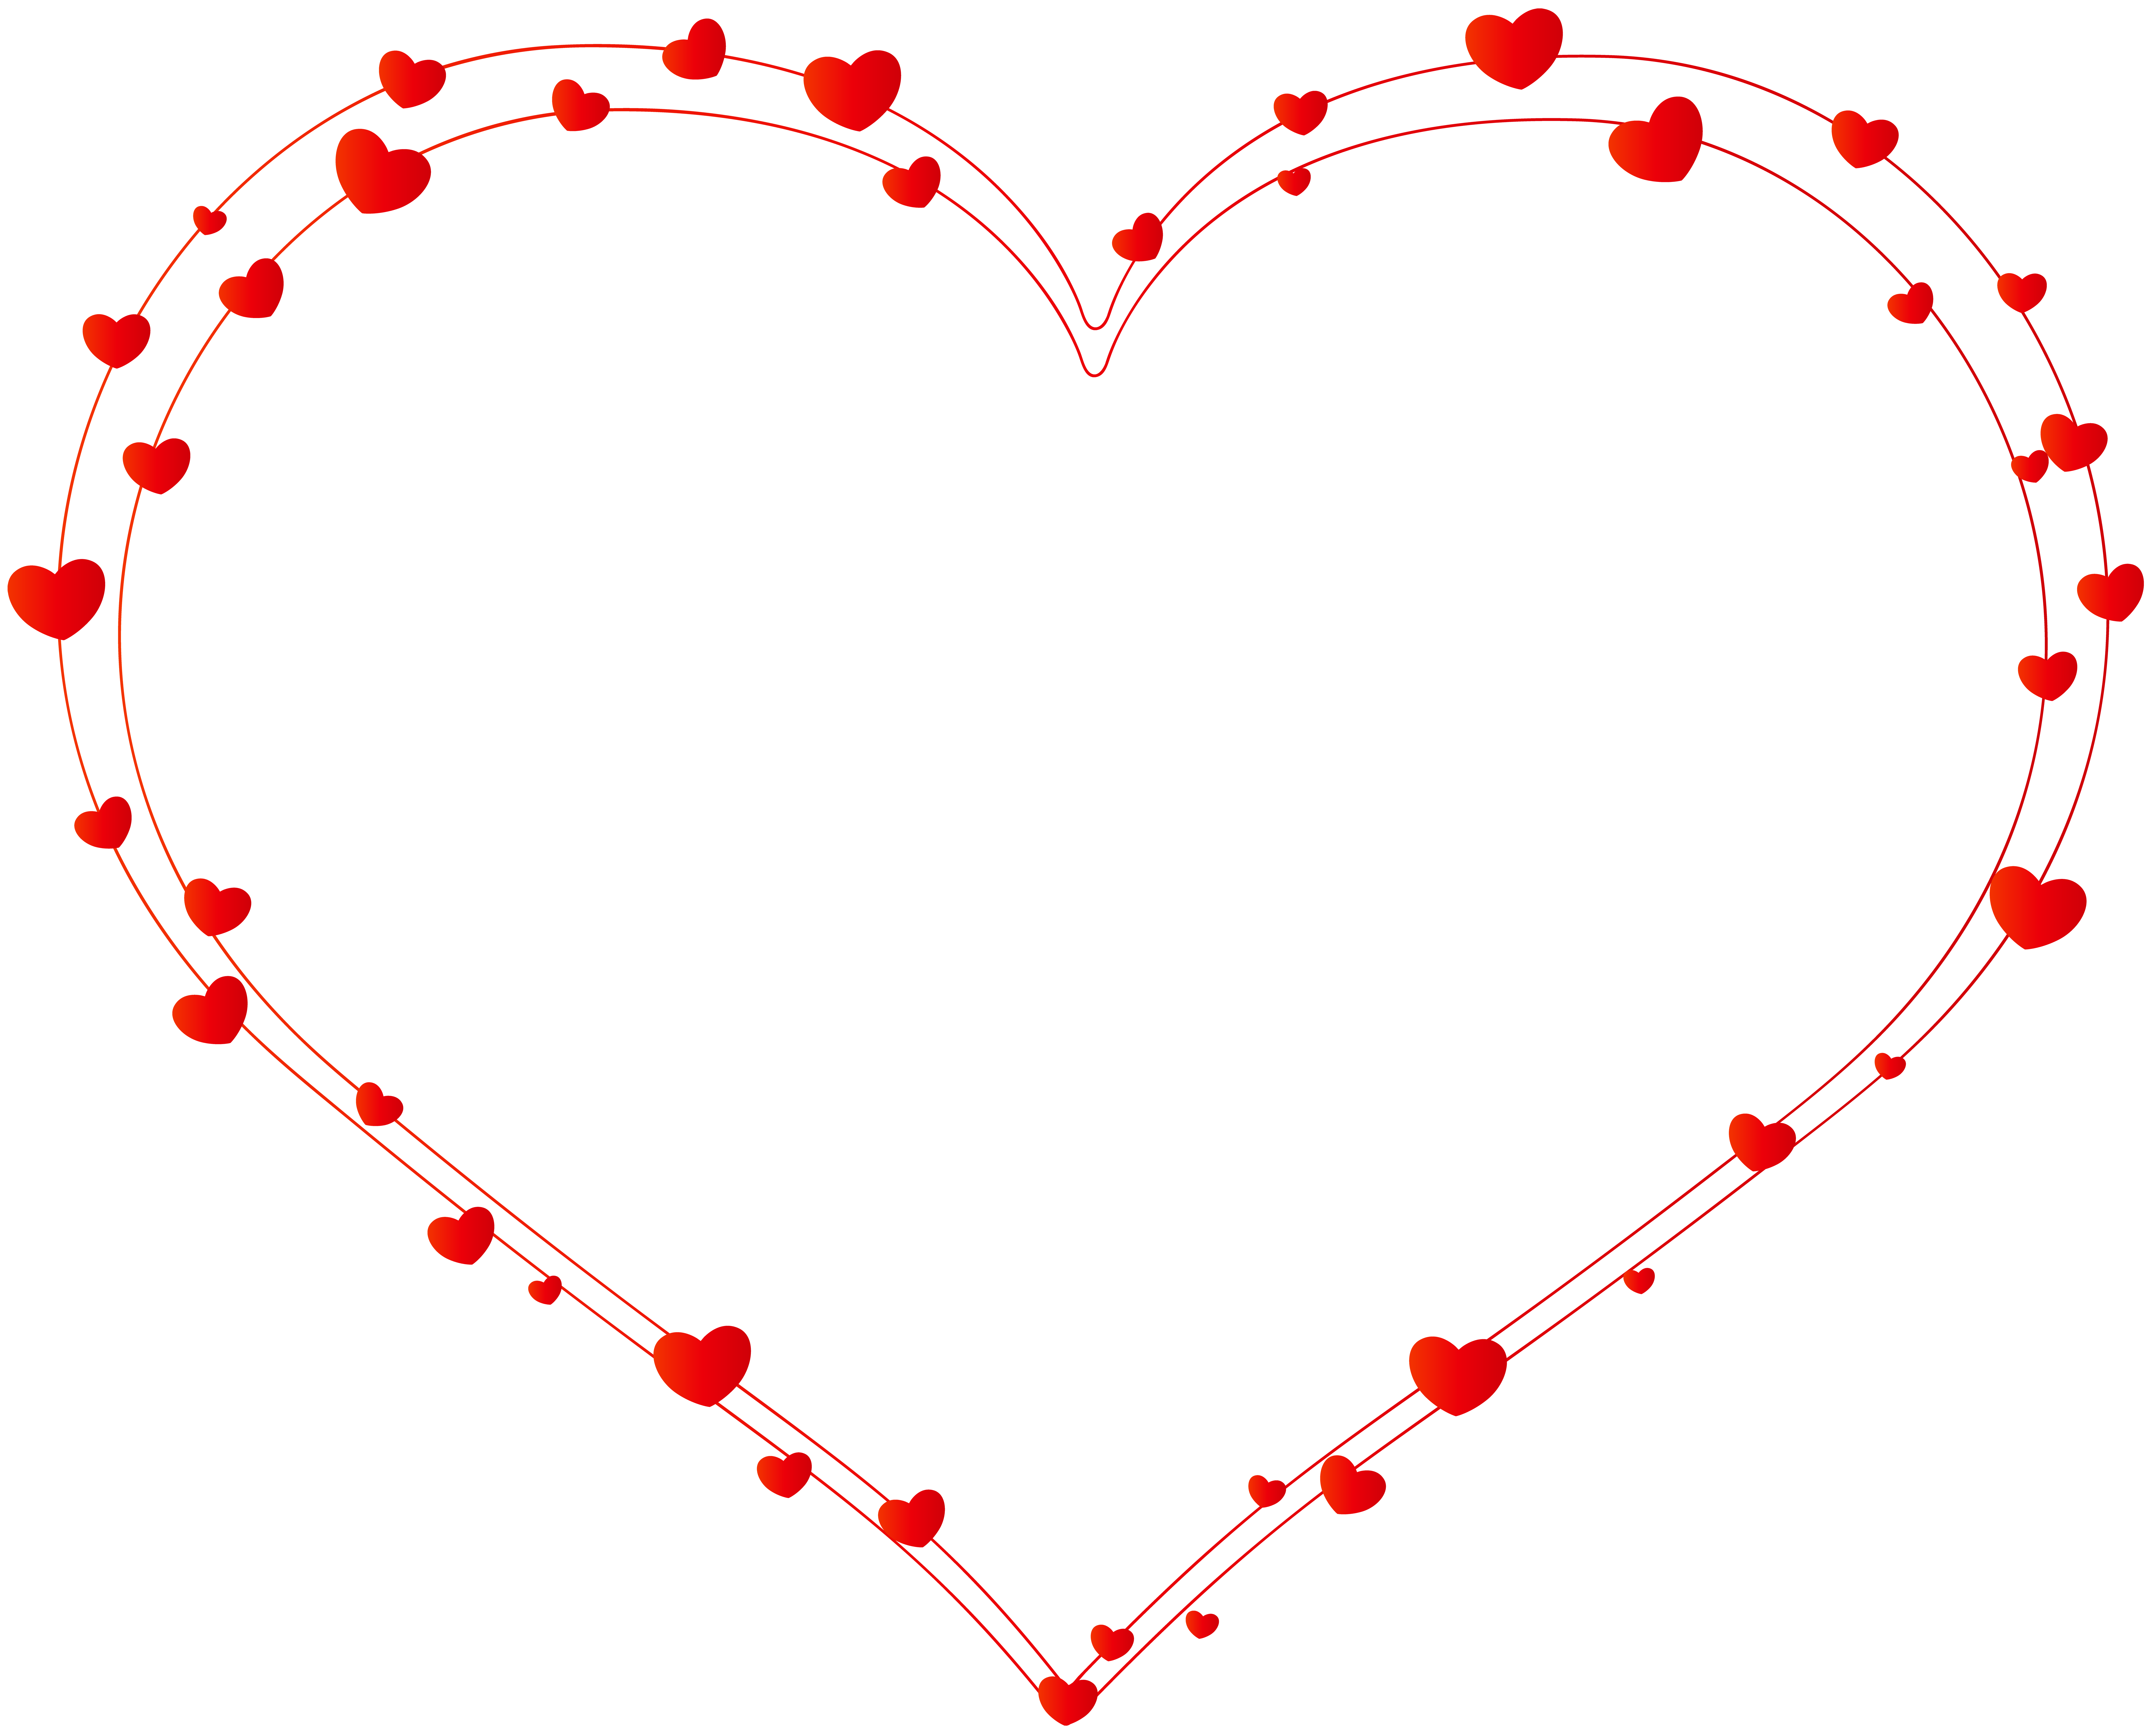 Line of hearts png. Deco heart transparent clip